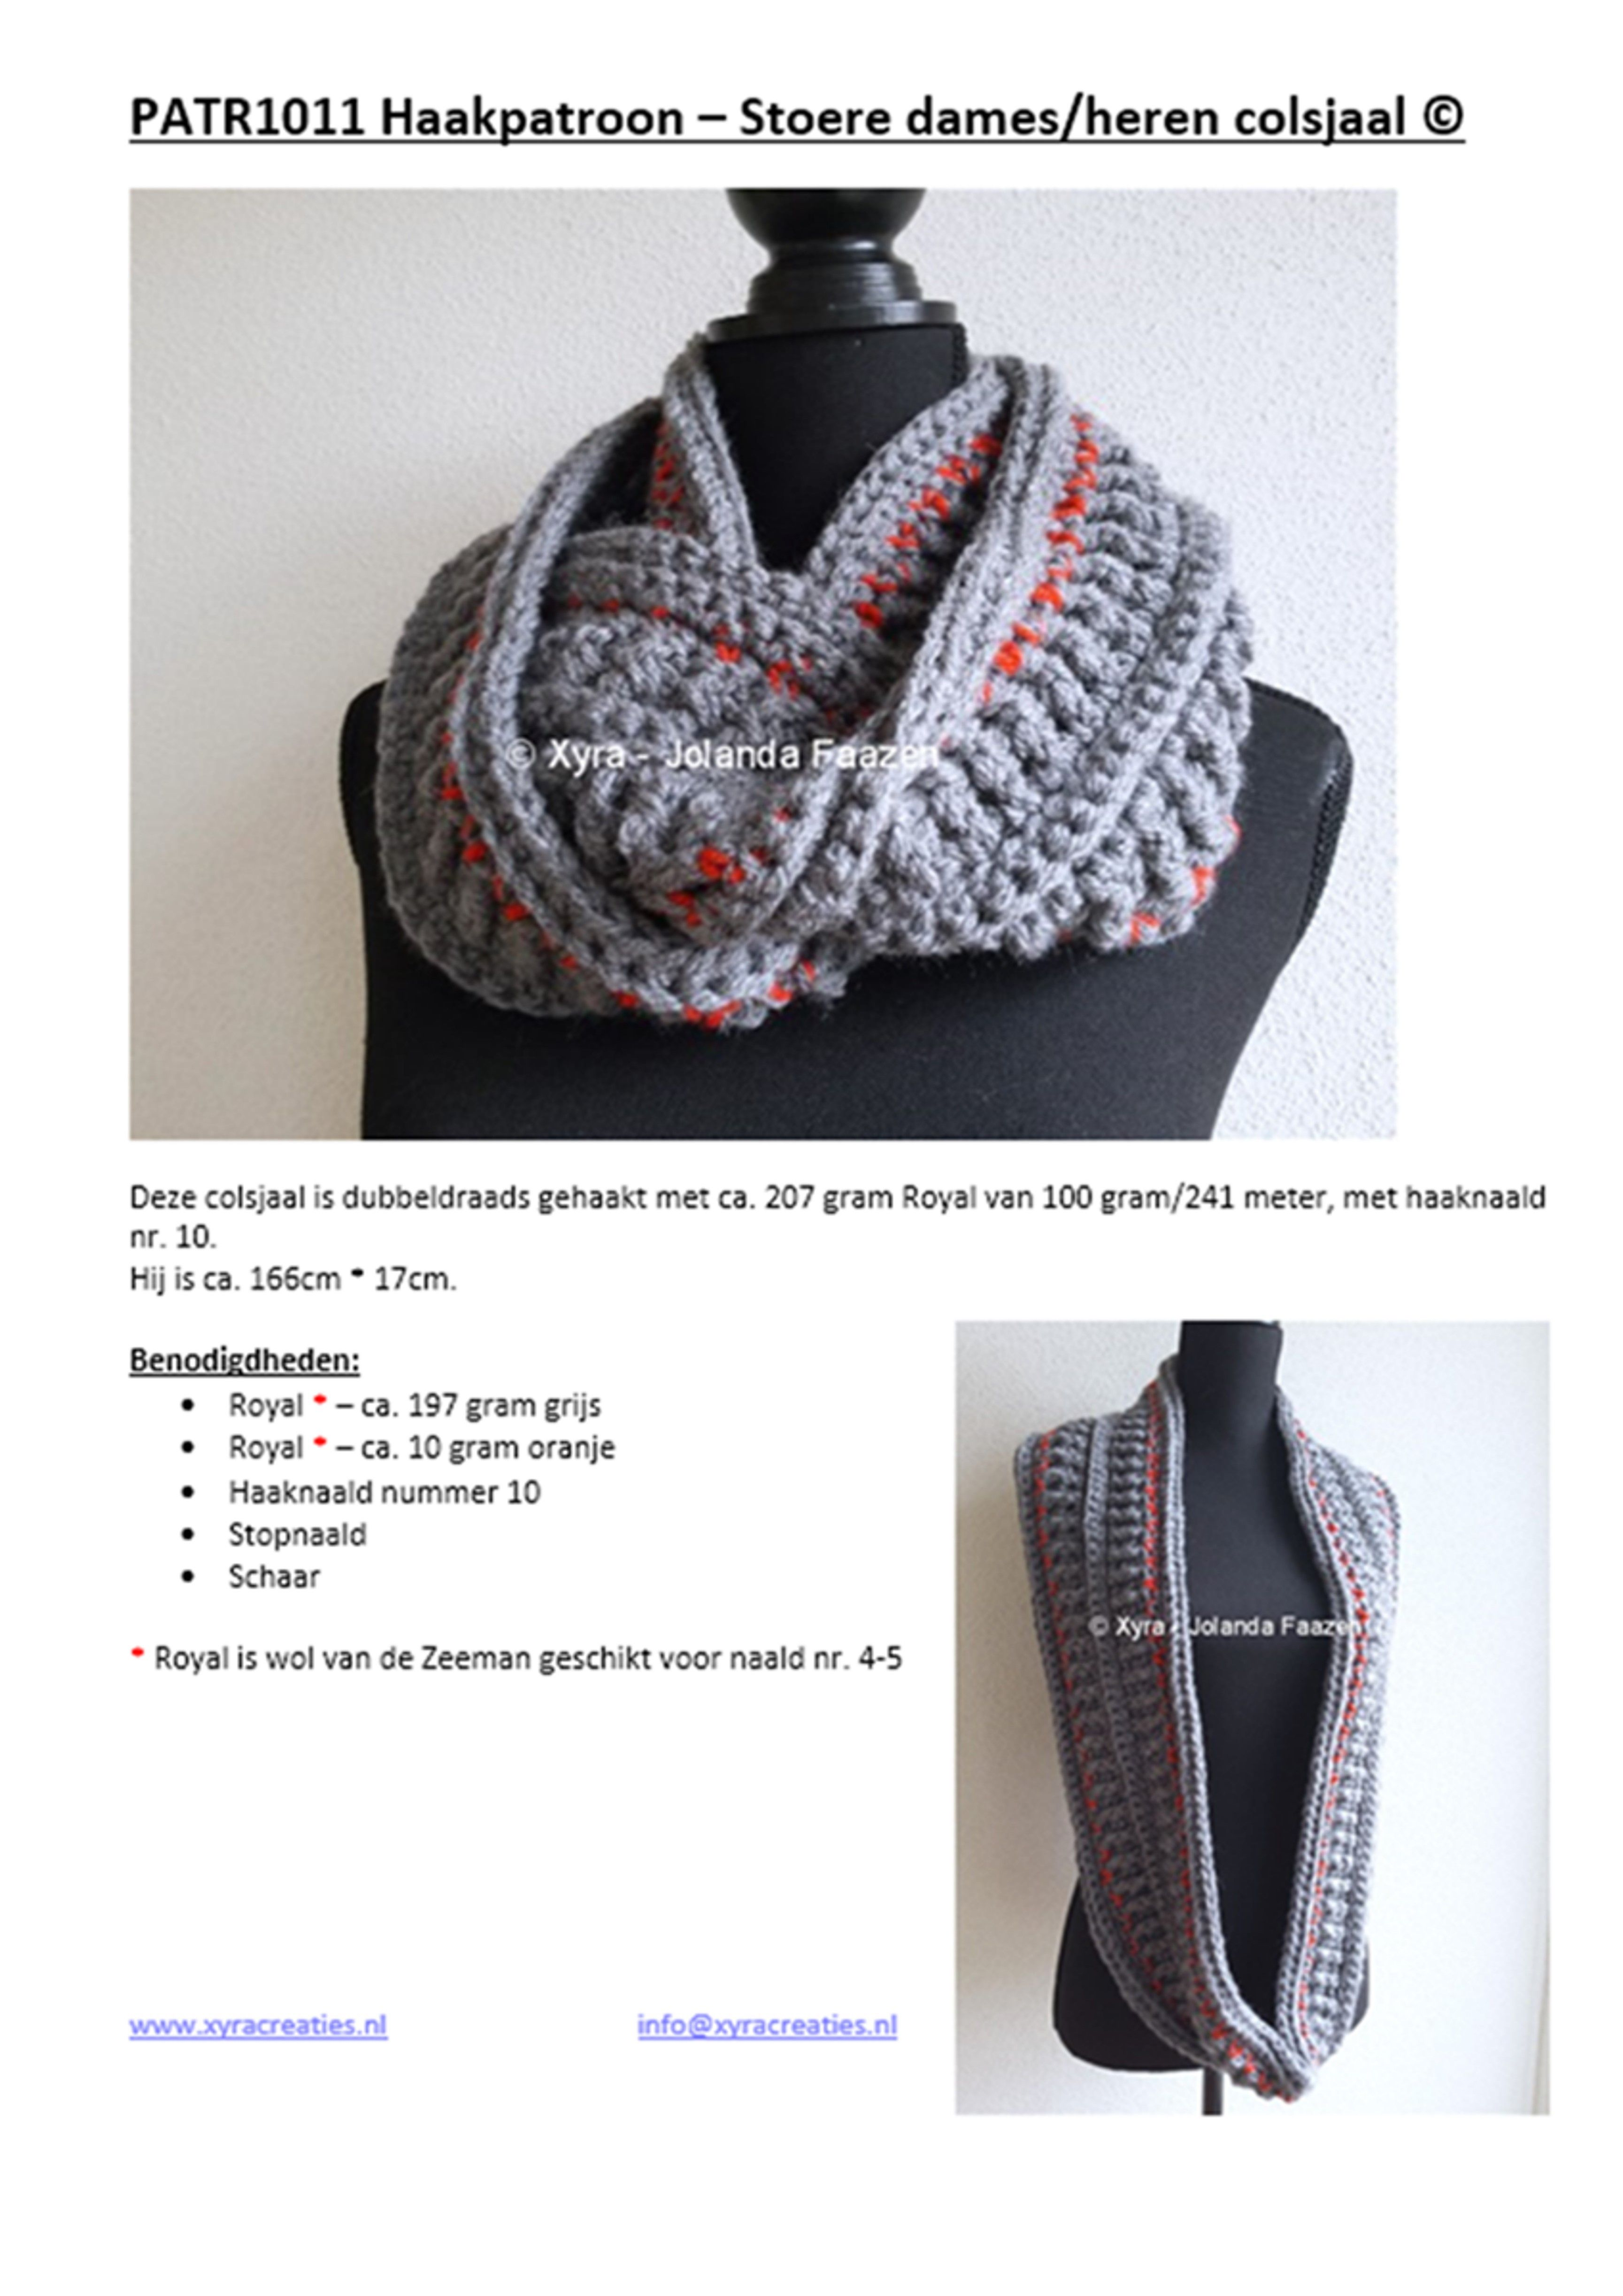 GRATIS patrón - xyra creaciones   De todo Crochet   Pinterest ...